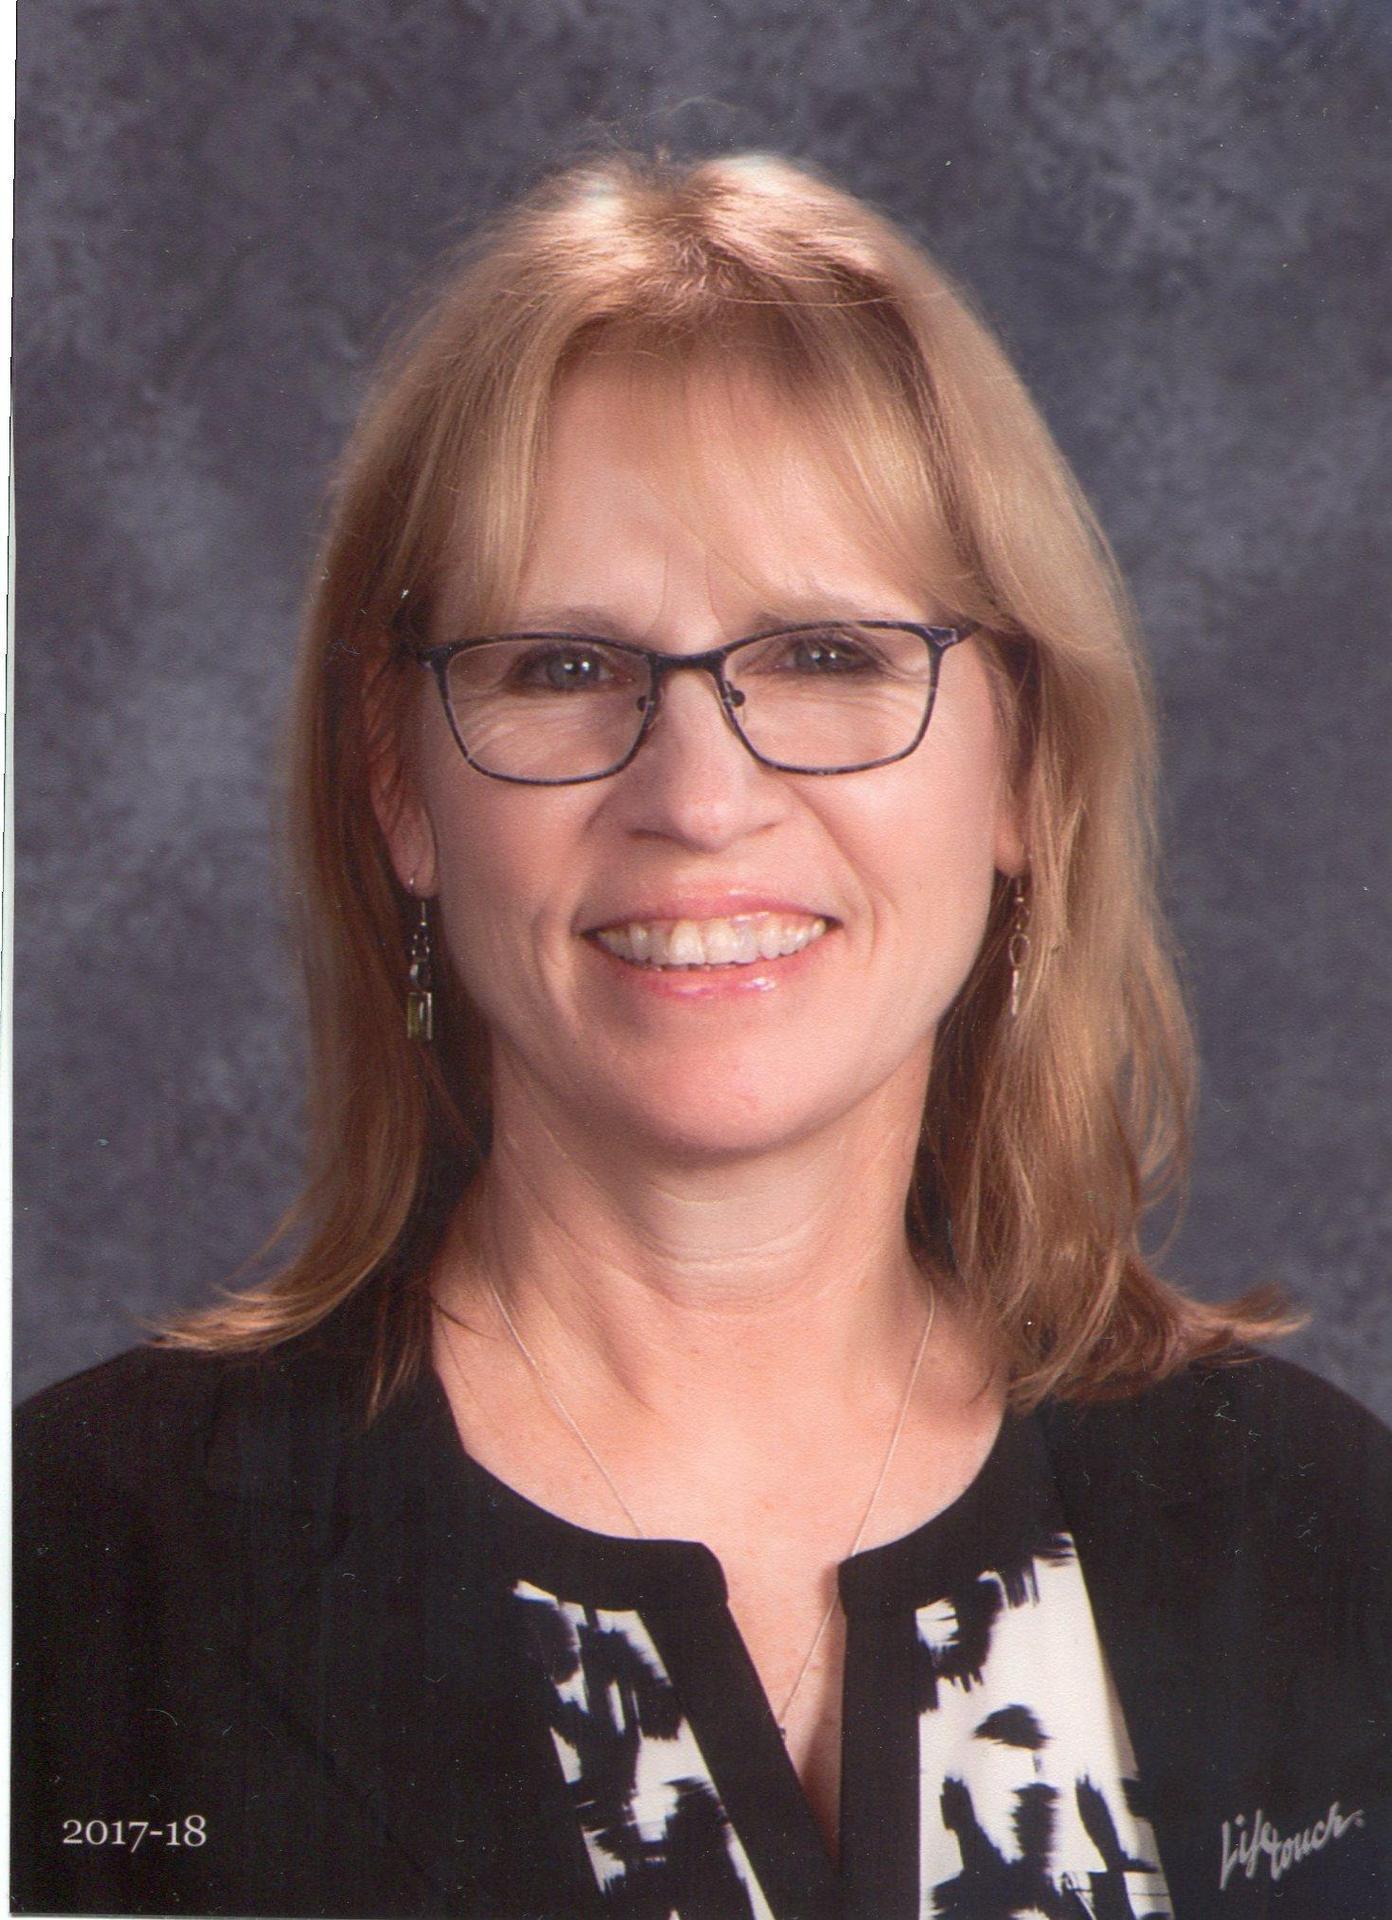 Pic of Asst. Principal Kim Fitzgerald